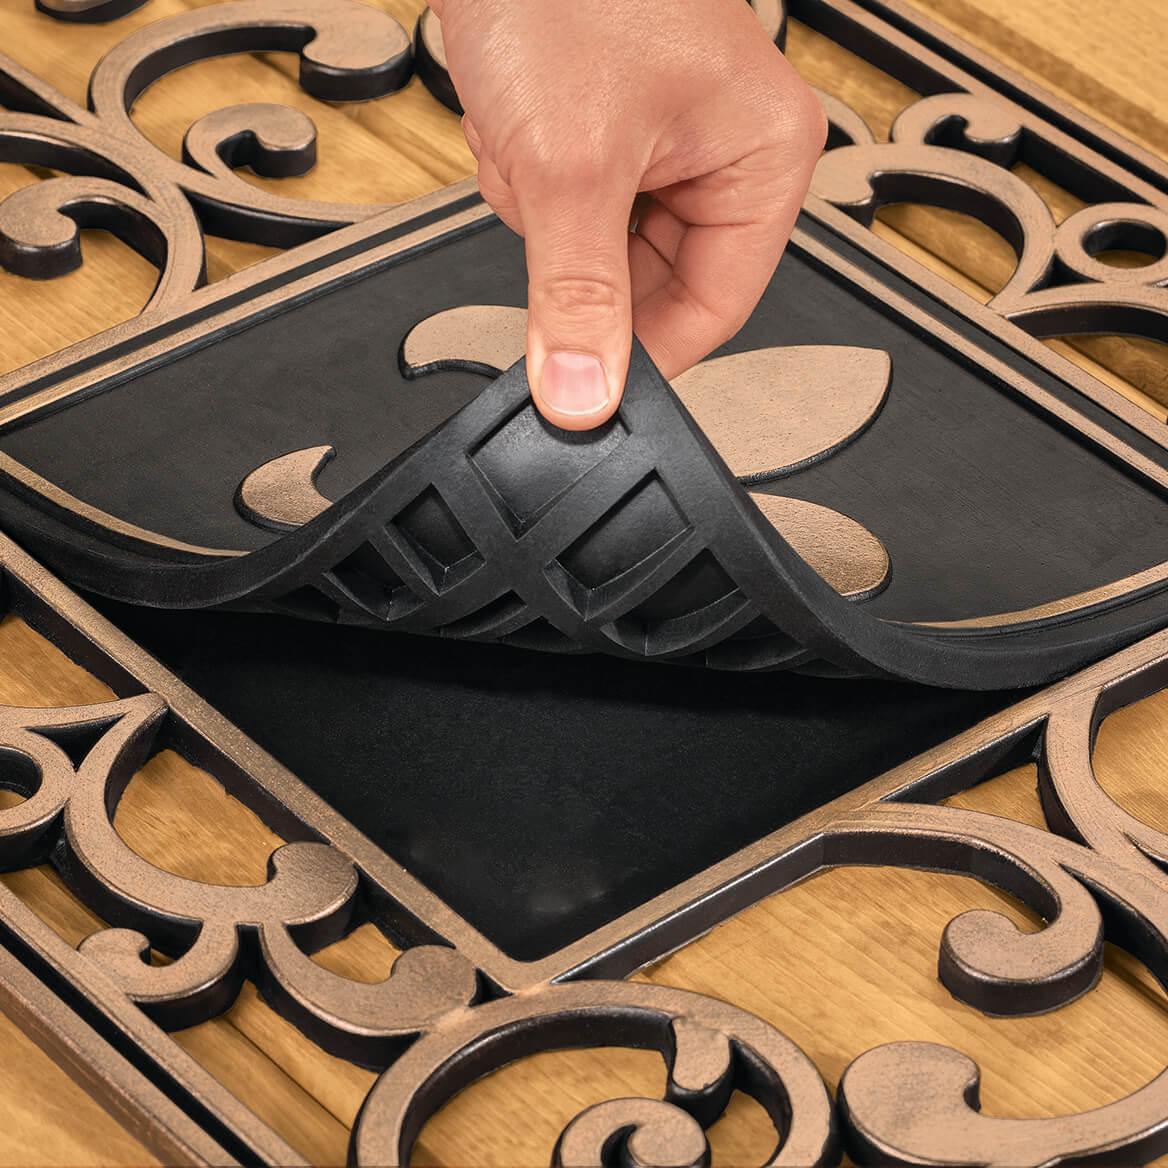 Hide-A-Key Doormat Insert-370491